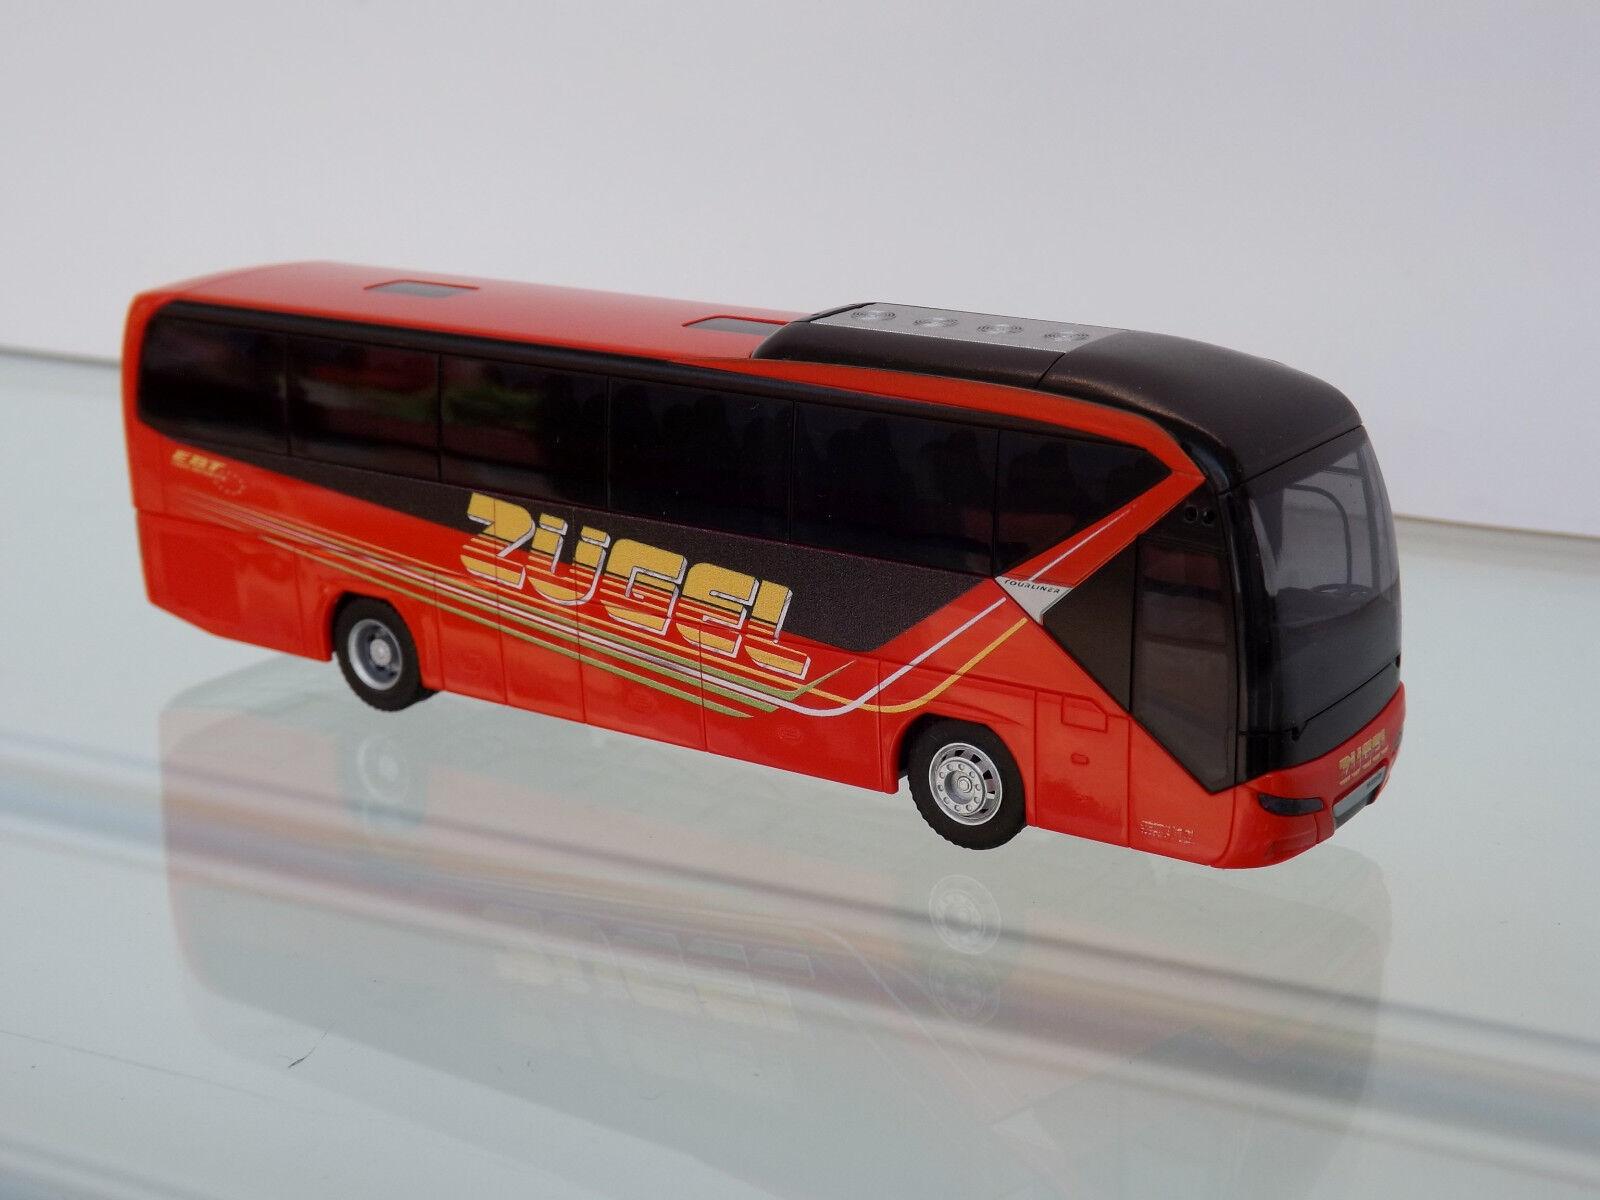 Rietze 73811 - 1 87 Bus NEOPLAN Tourliner 2016 rênes Wüstenrouge-NEUF dans neuf dans sa boîte